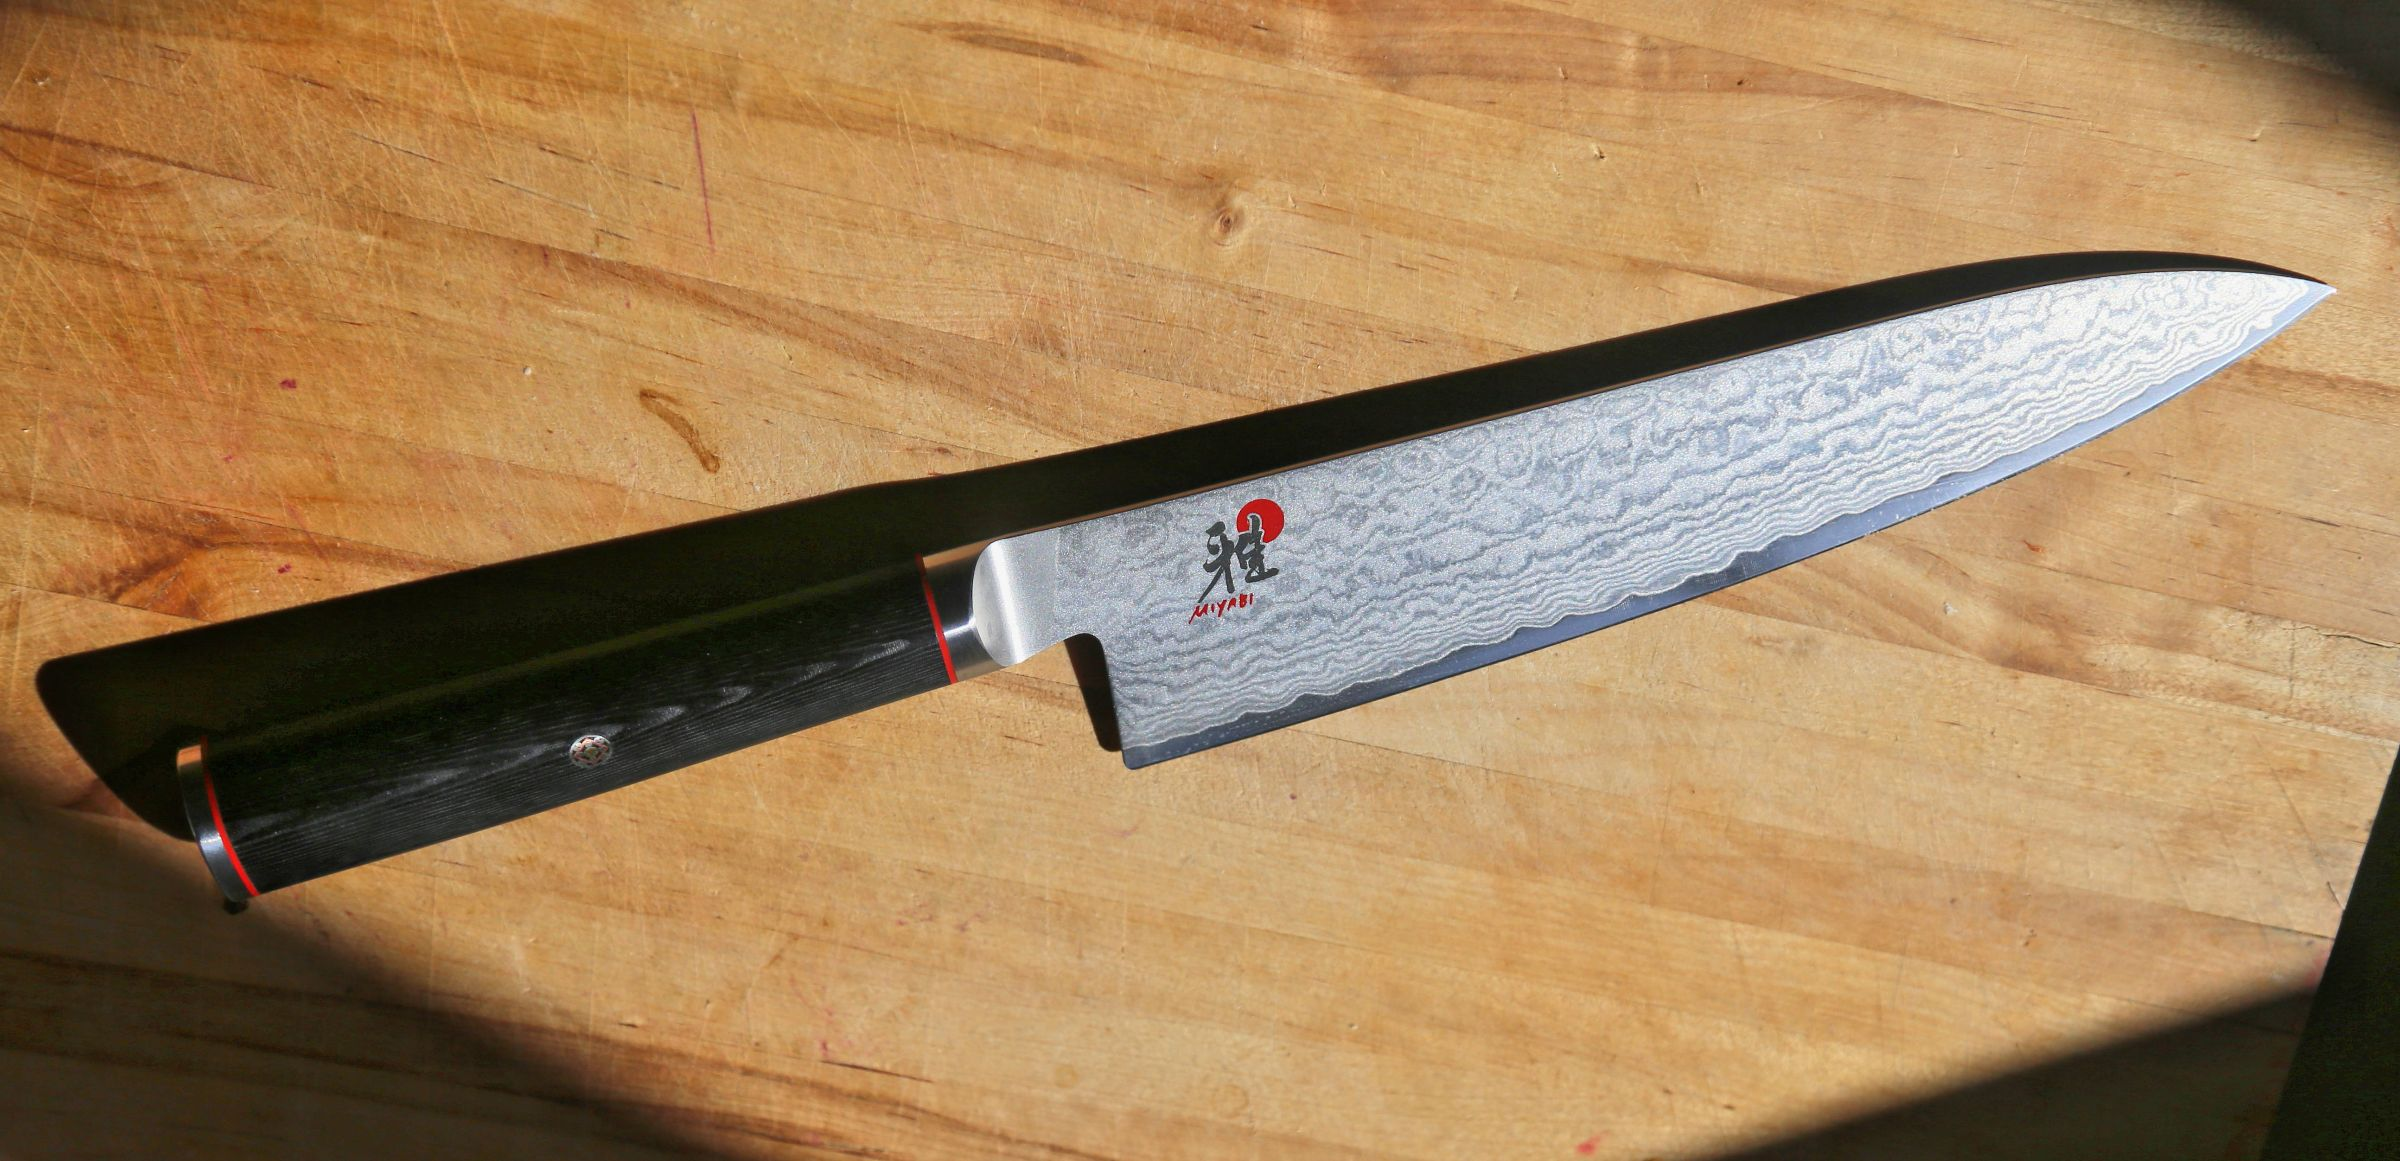 The Miyabi 5000DP Gyutoh 200 chef knife 8-Inch